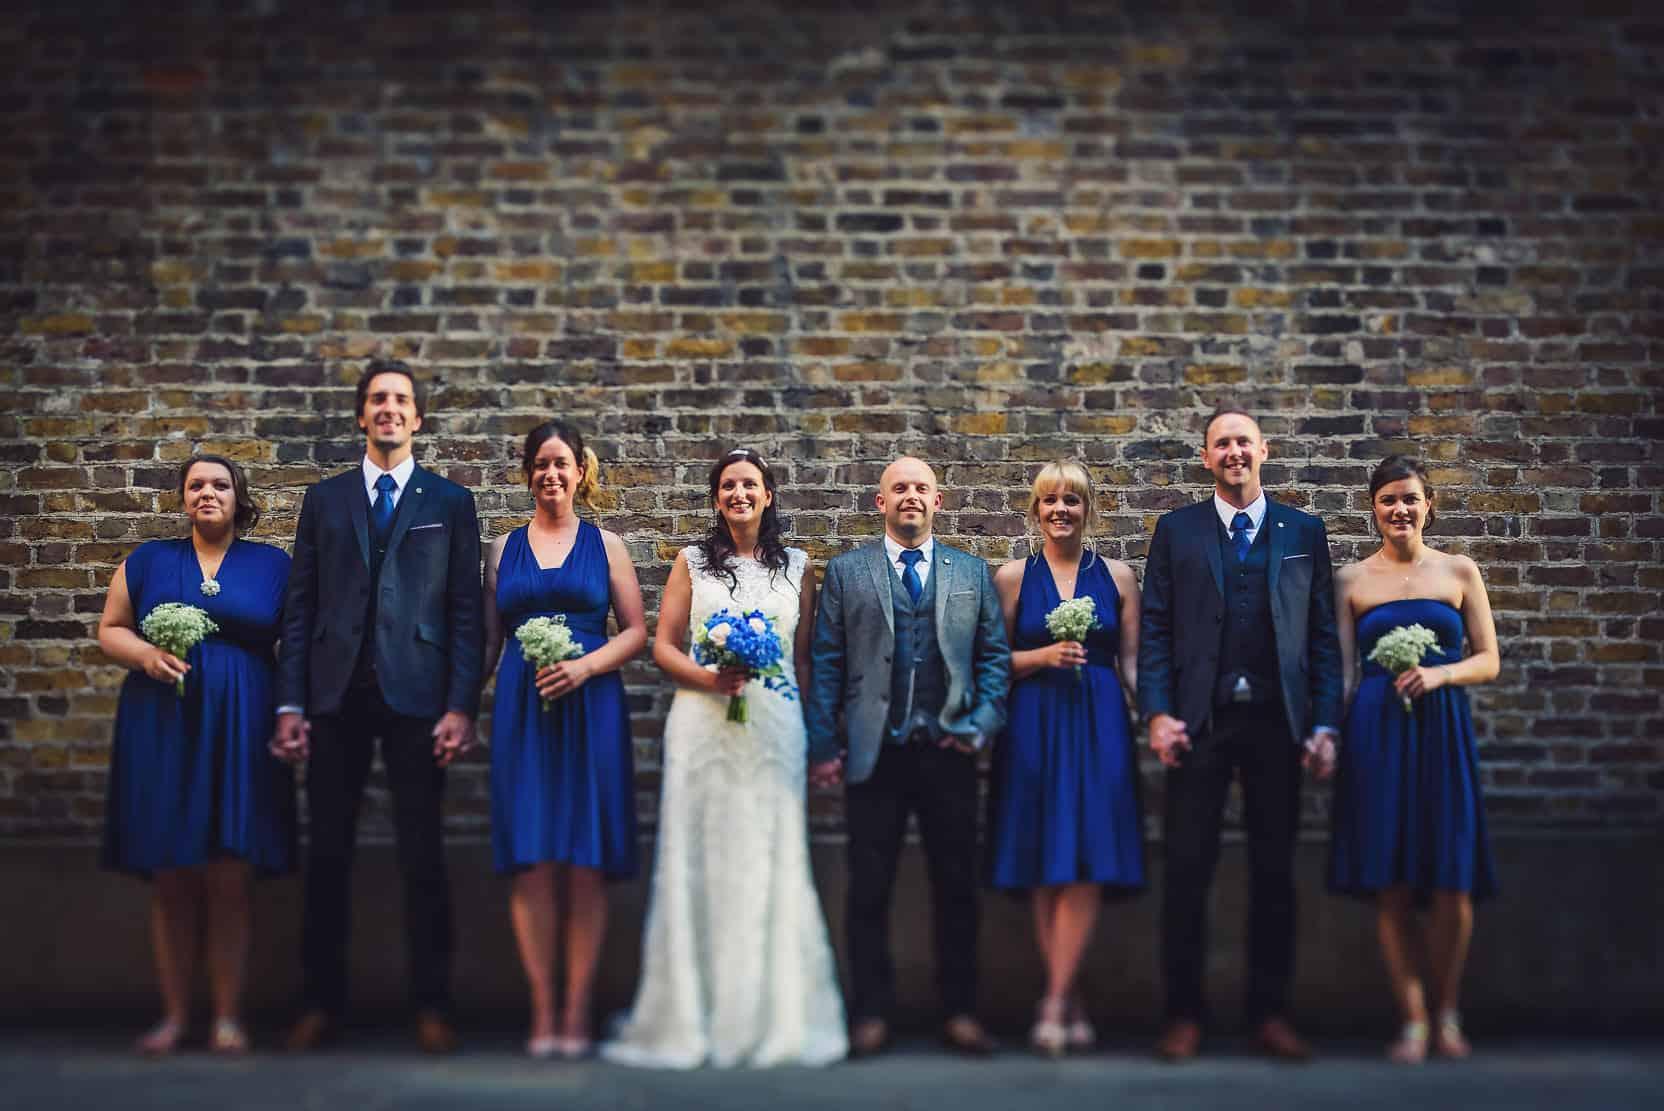 wedding_photography_asia_house_london_ld_justin_bailey_photography_016